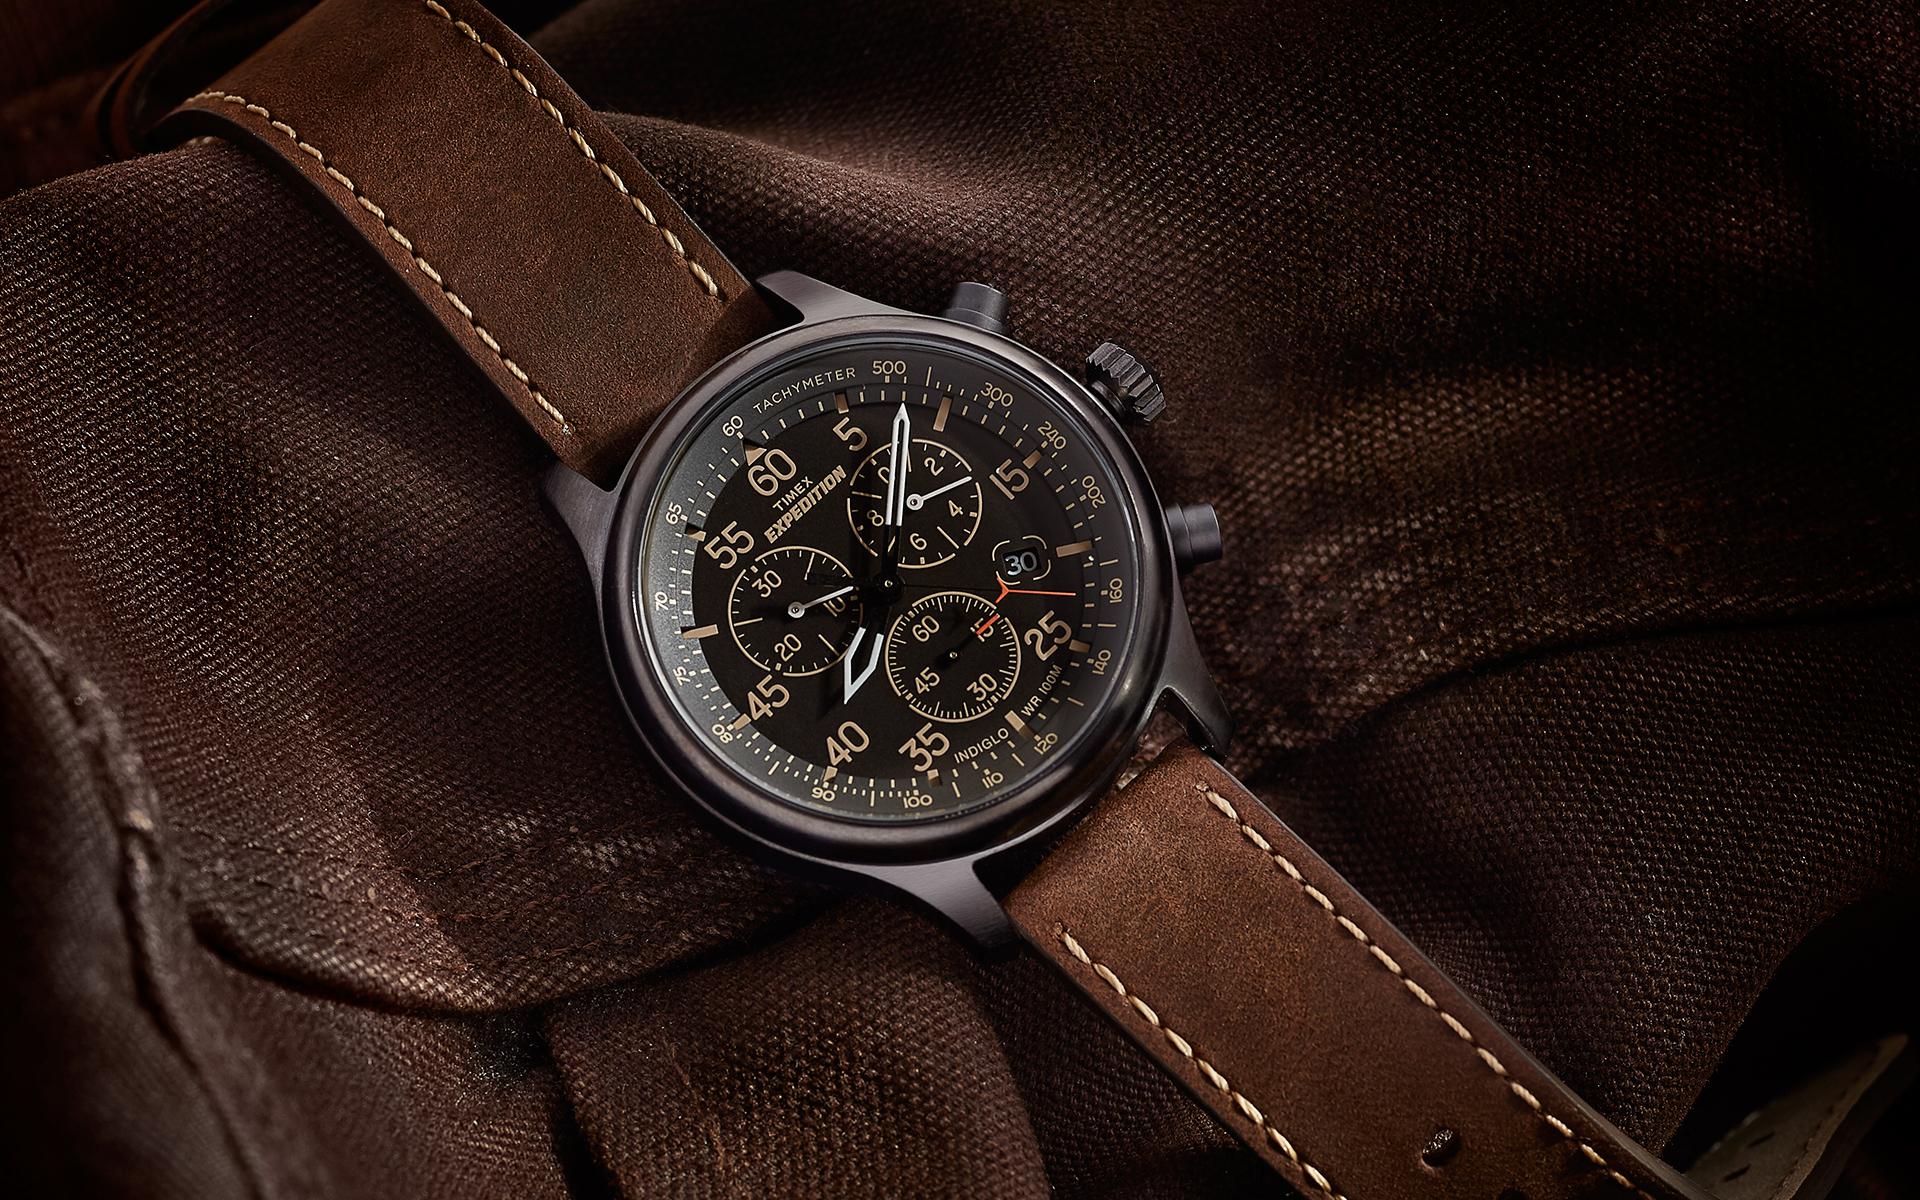 Timex_Expedition_Watch.jpg